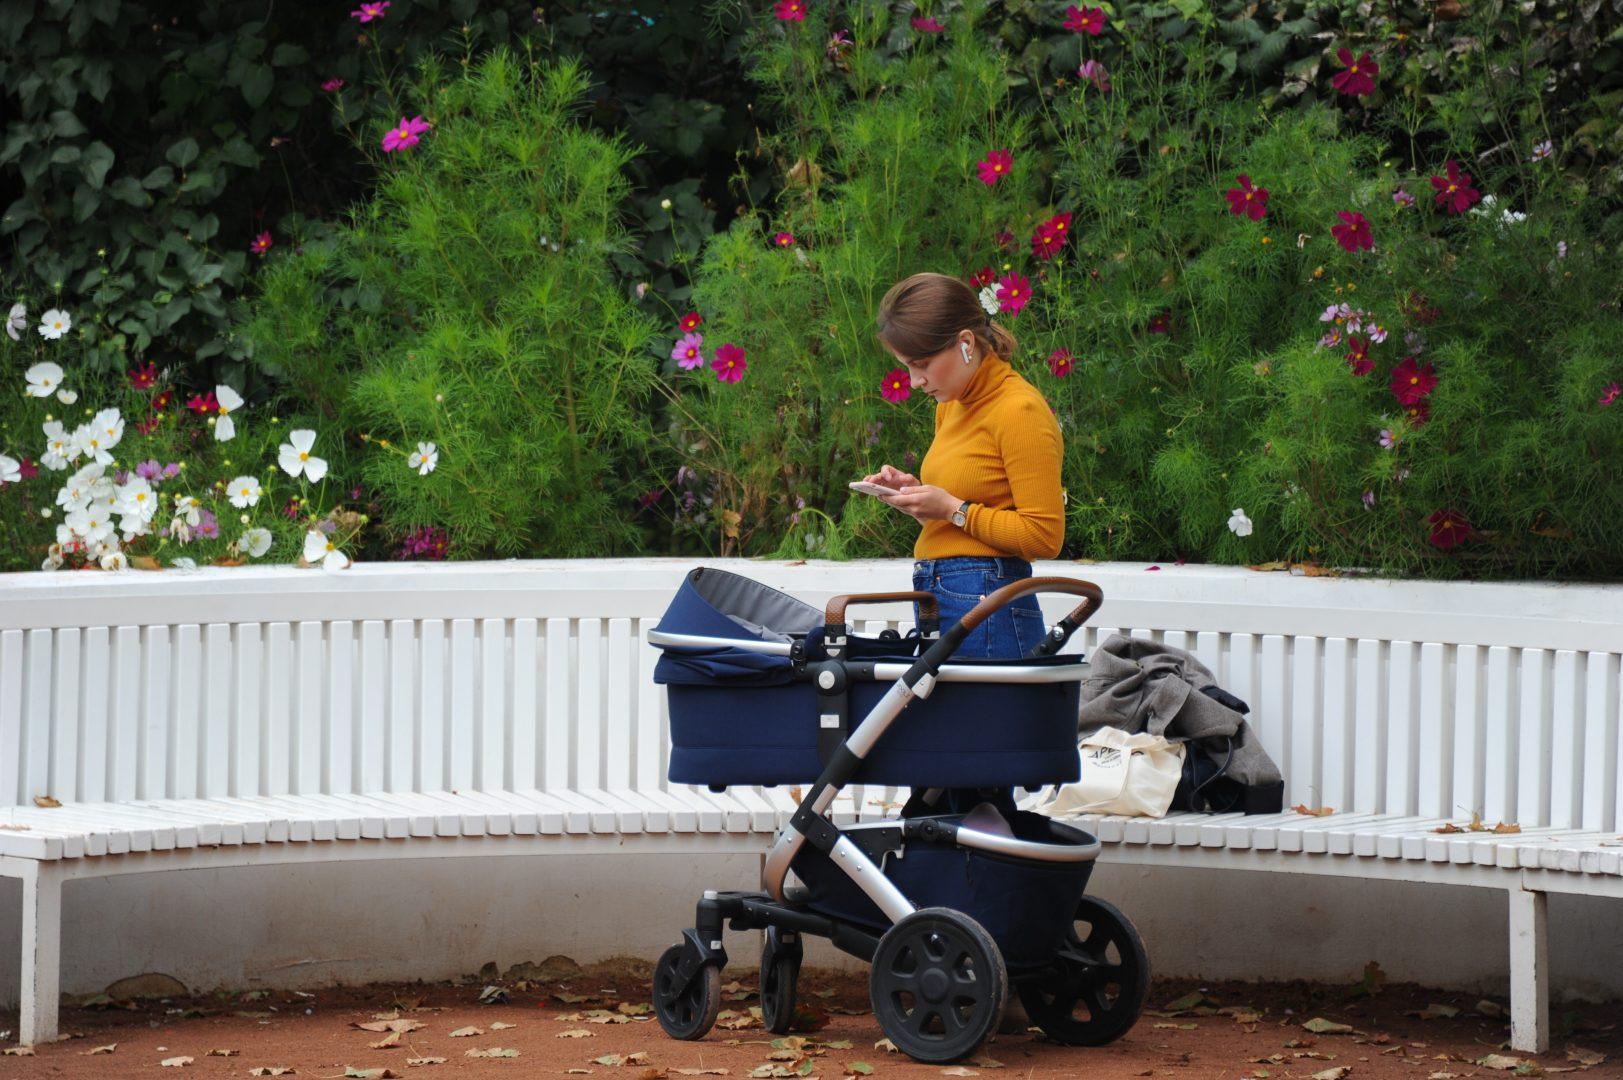 Наклонные площадки облегчат передвижение в подъездах родителям с детскими колясками. Фото: Светлана Колоскова, «Вечерняя Москва»